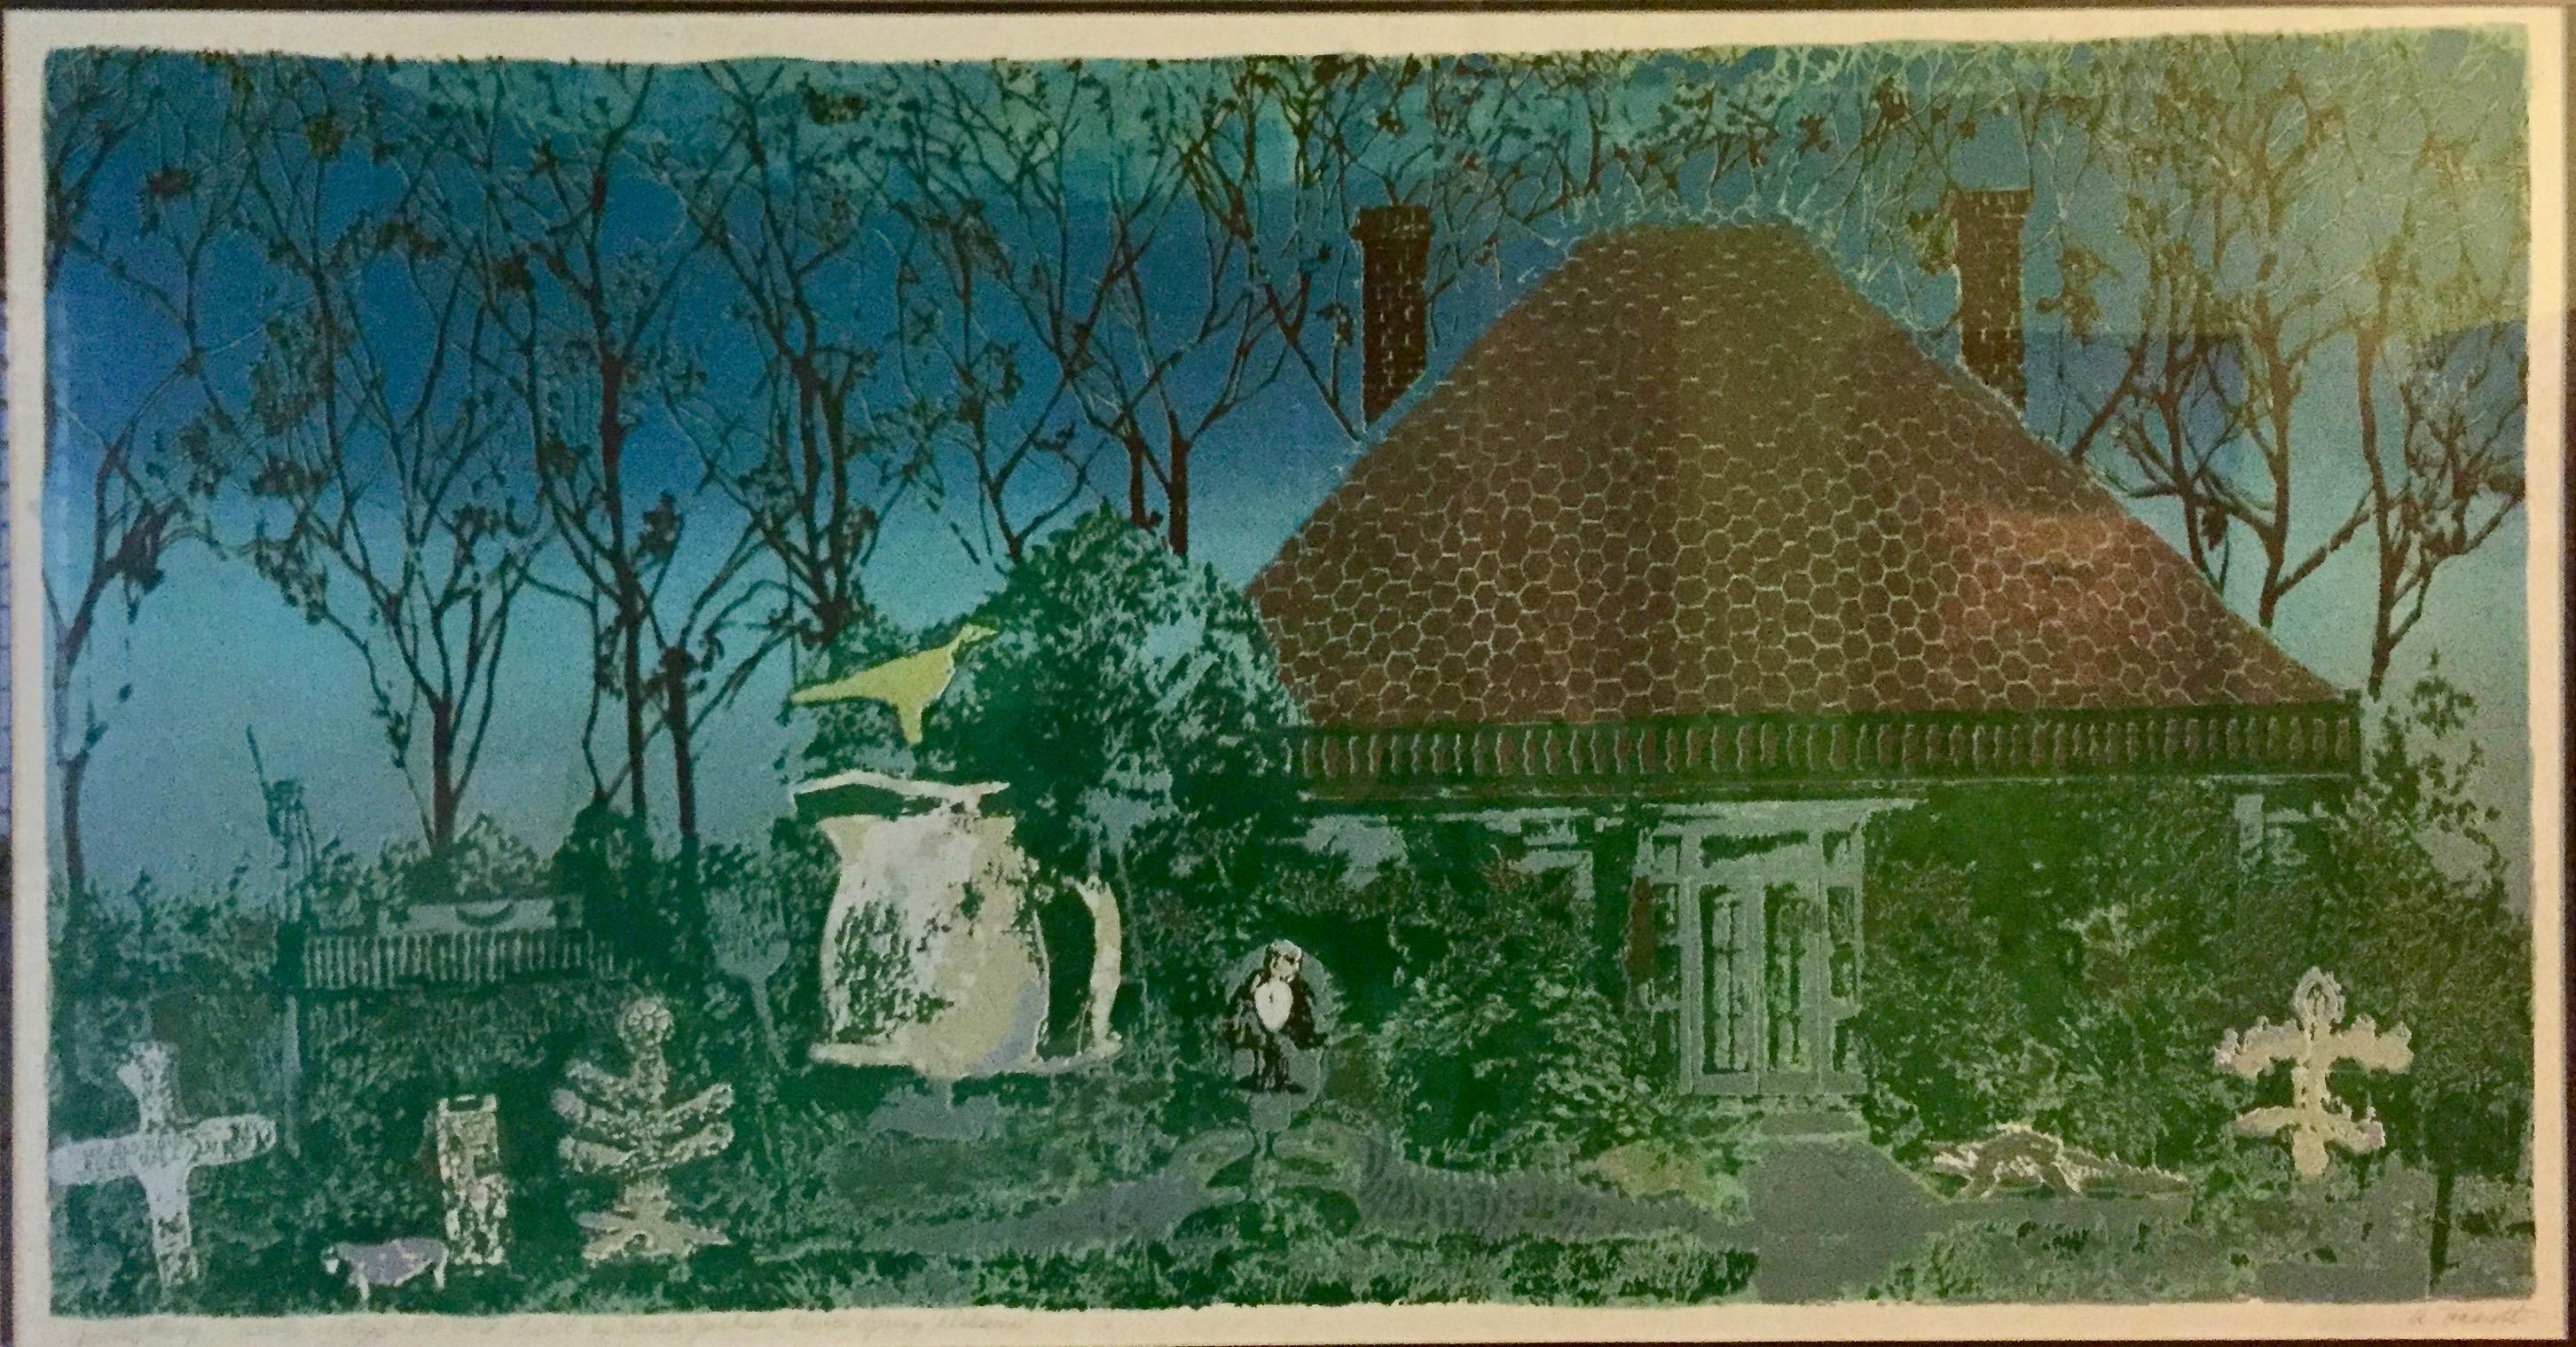 Anton Haardt's print of a garden in Montgomery, Alabama, that our dear friend Boogie gave us when we got married in August 1989.